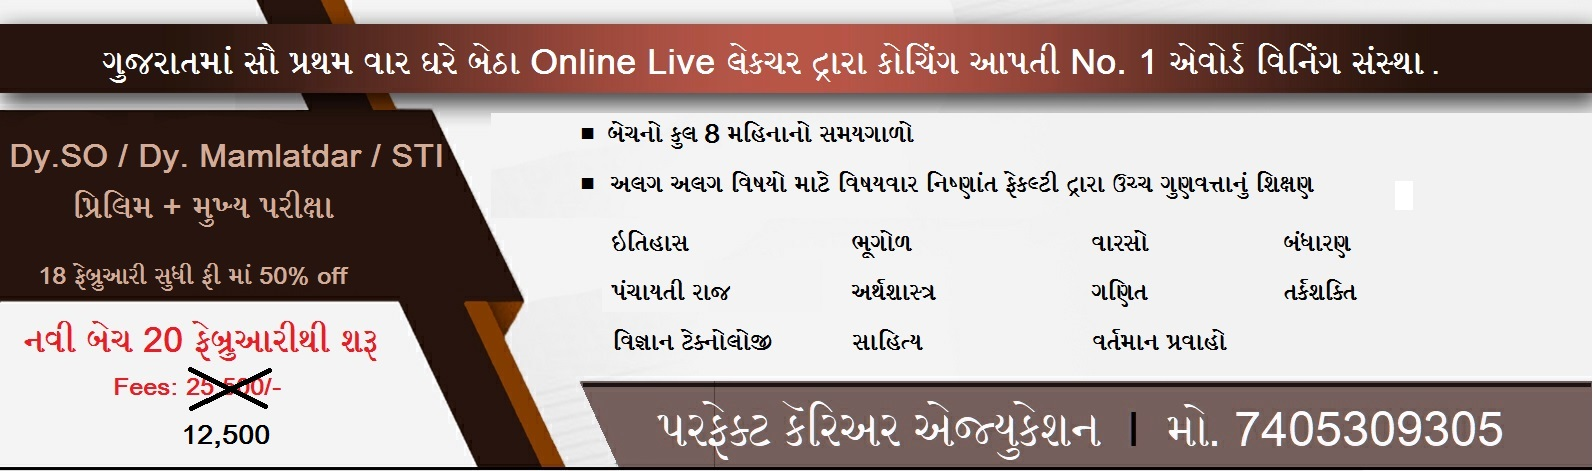 Gujarat' Geography - 1 banner